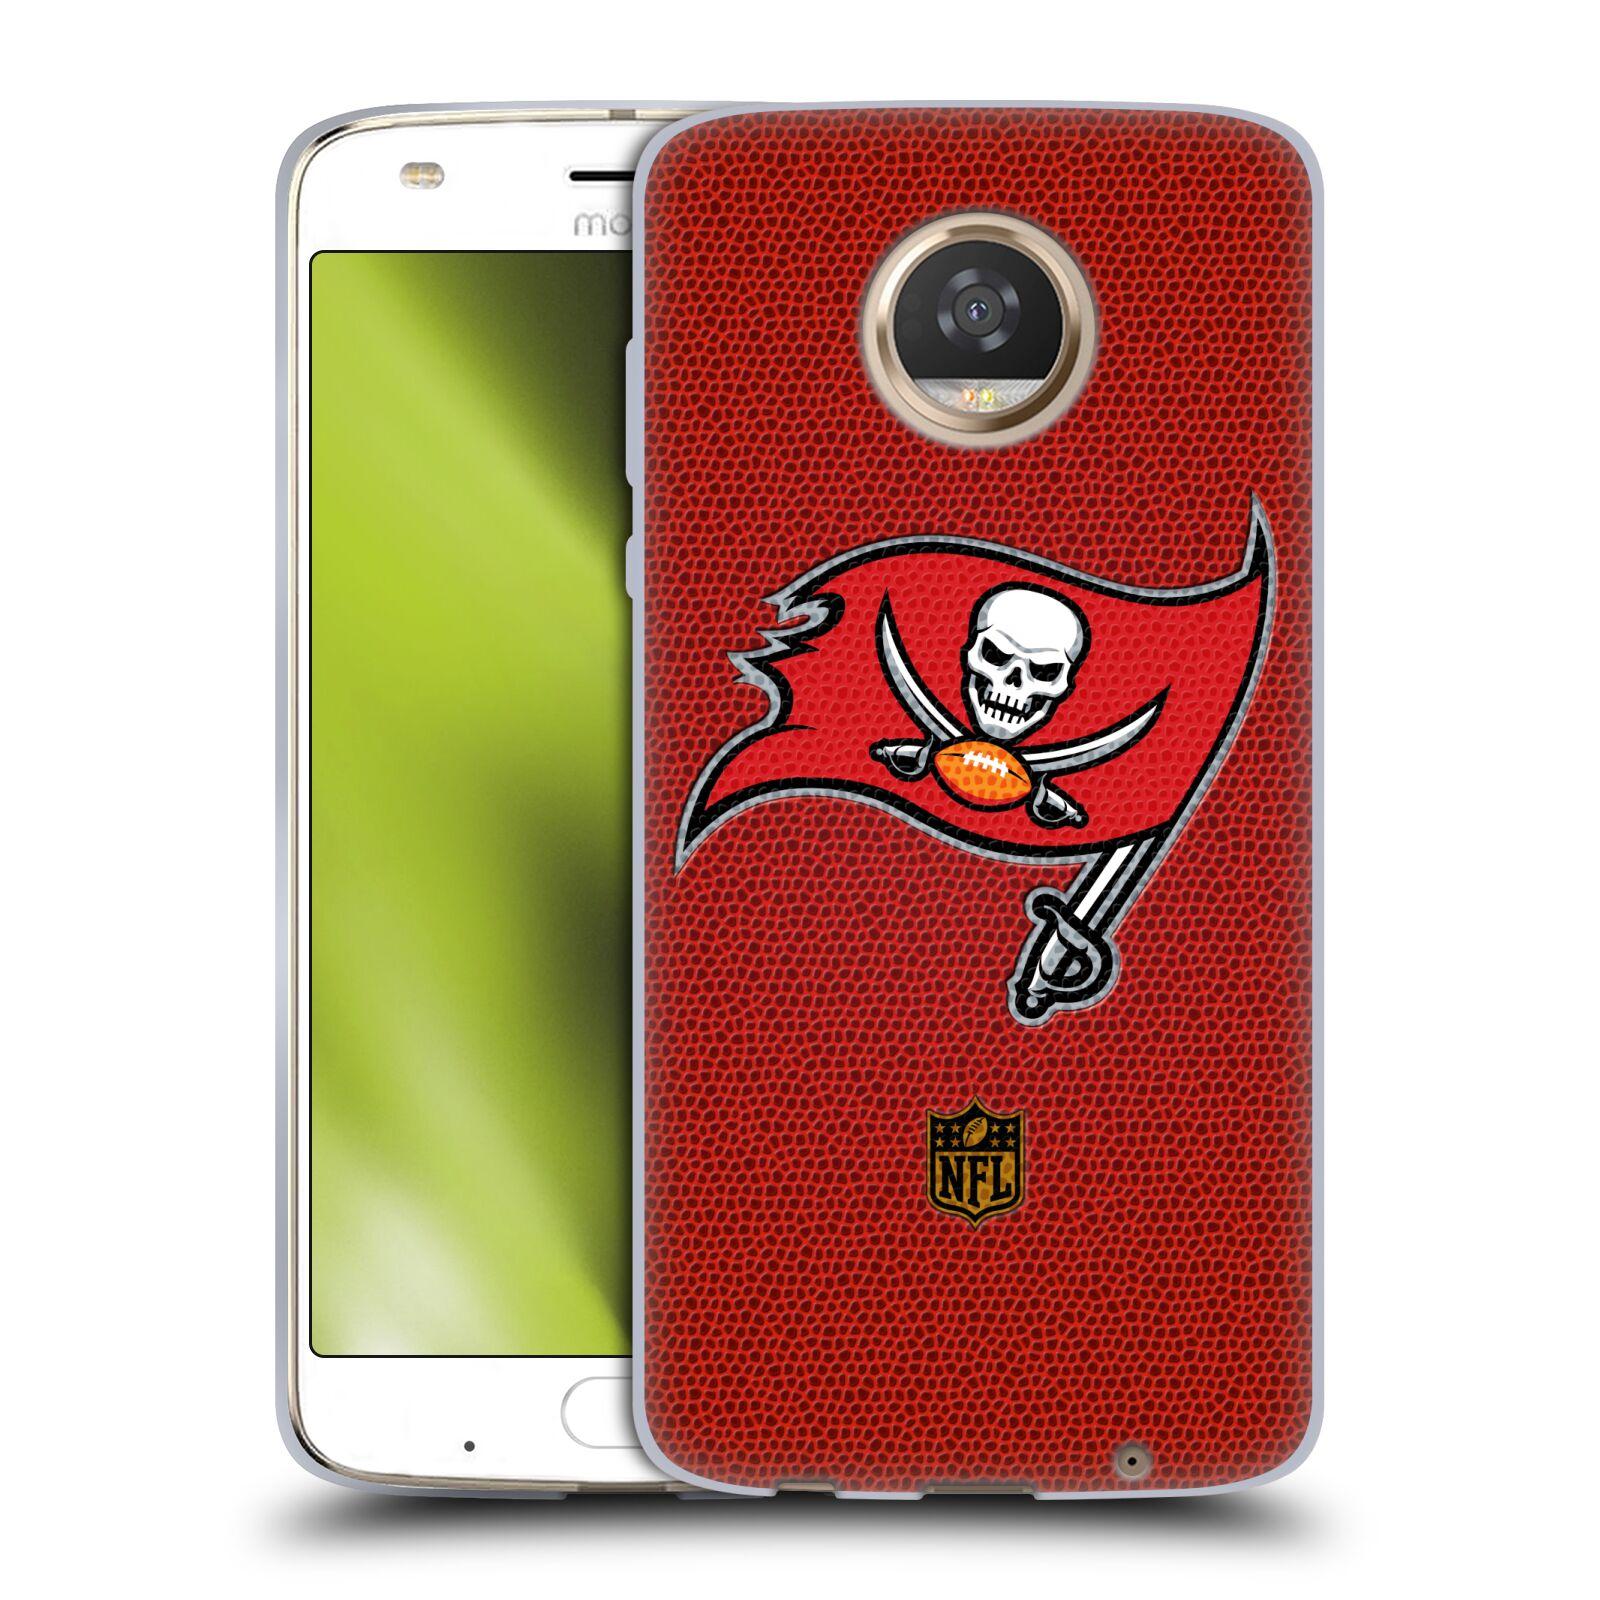 OFFICIAL-NFL-TAMPA-BAY-BUCCANEERS-LOGO-SOFT-GEL-CASE-FOR-MOTOROLA-PHONES